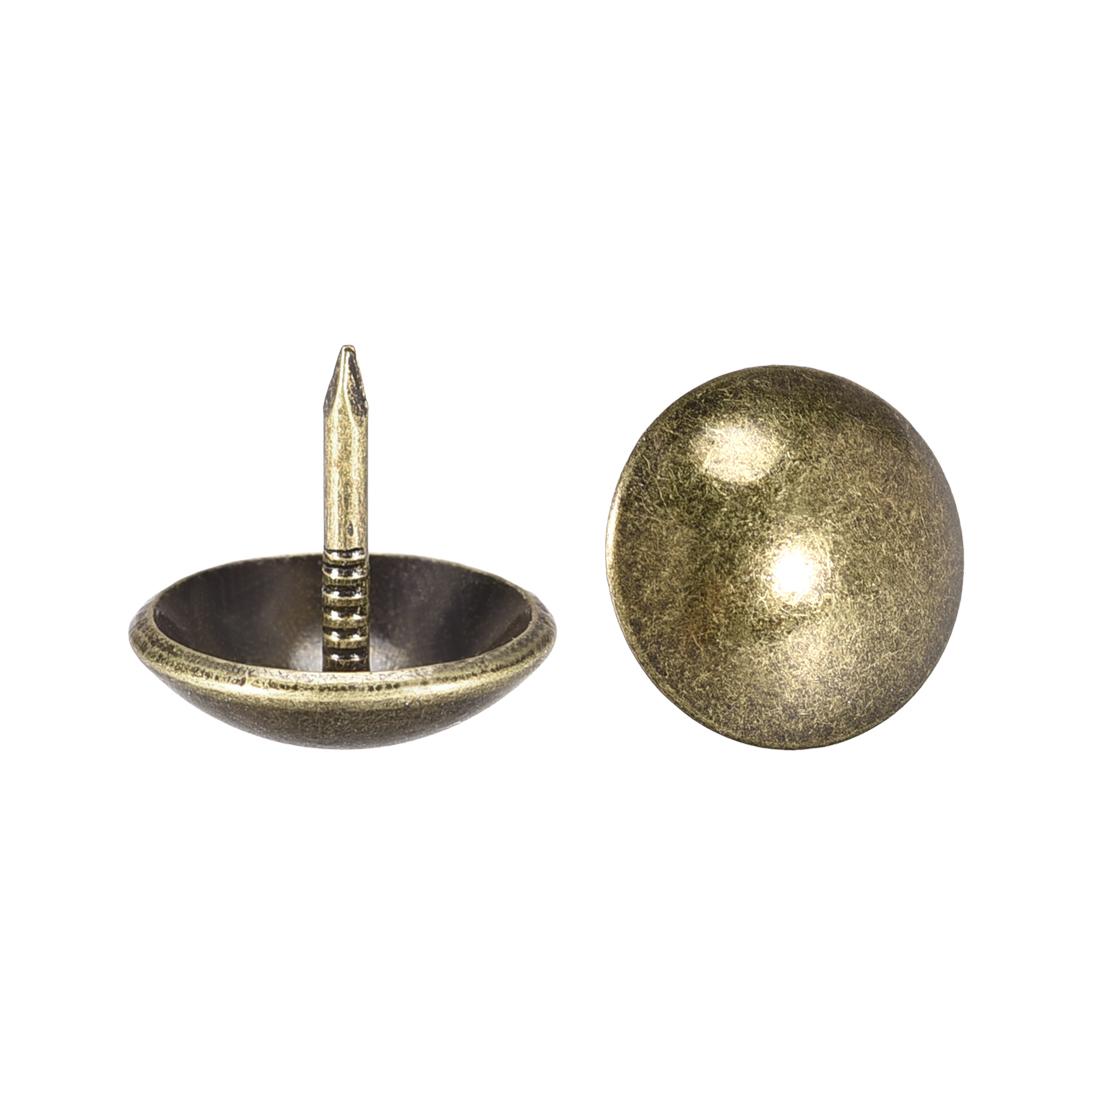 Upholstery Nails Tacks 14mm Dia 13mm Height Round Push Pins Bronze Tone 30 Pcs